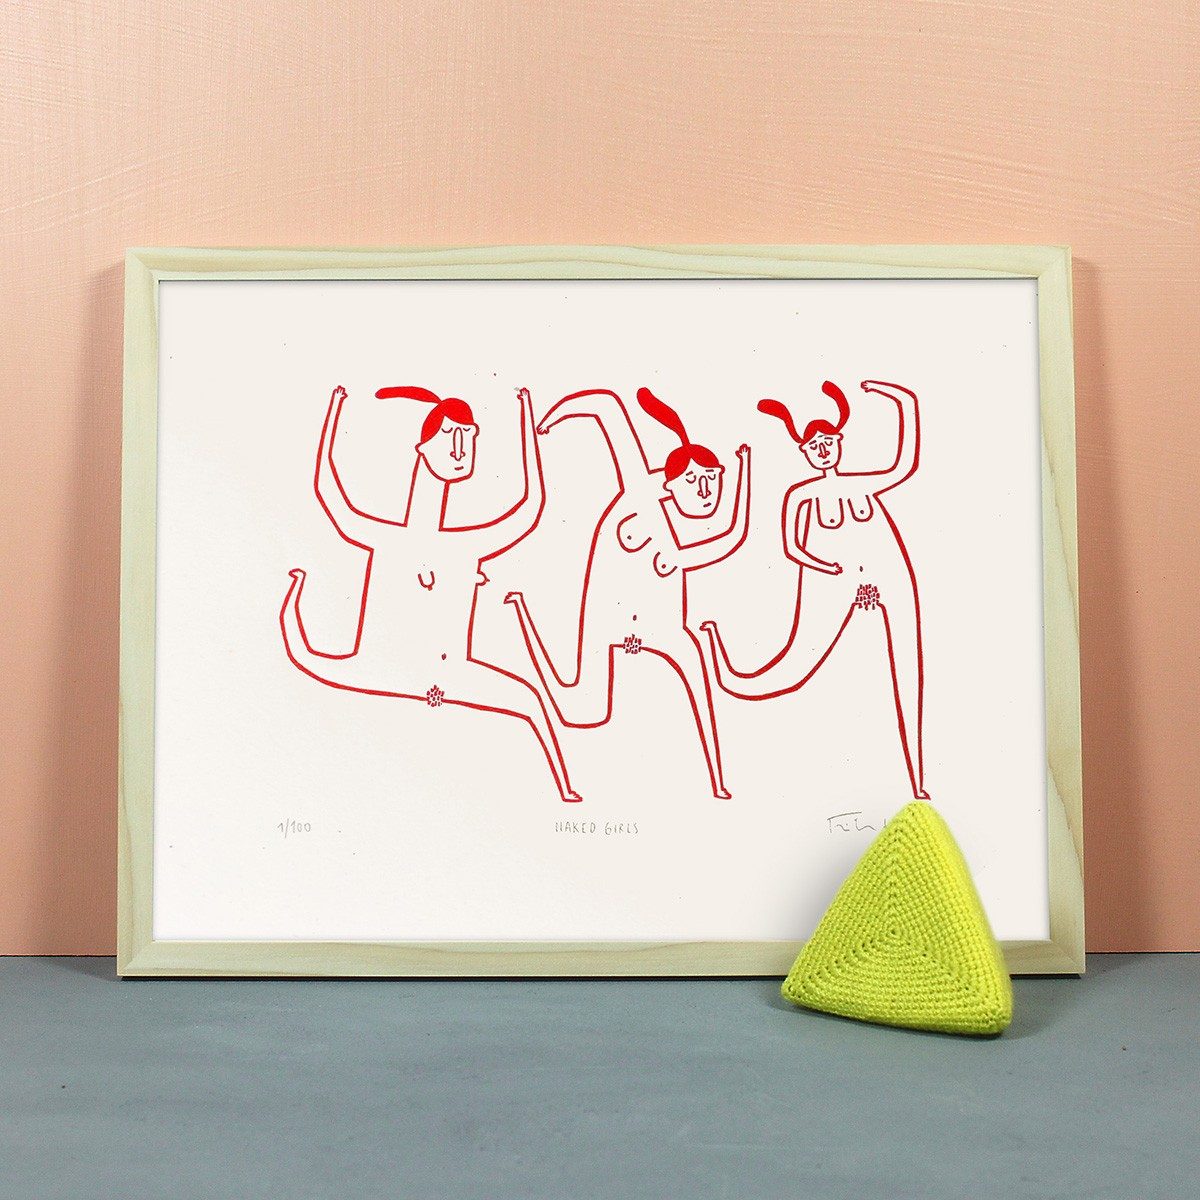 Knallbraun – Naked Girls | Linolschnitt